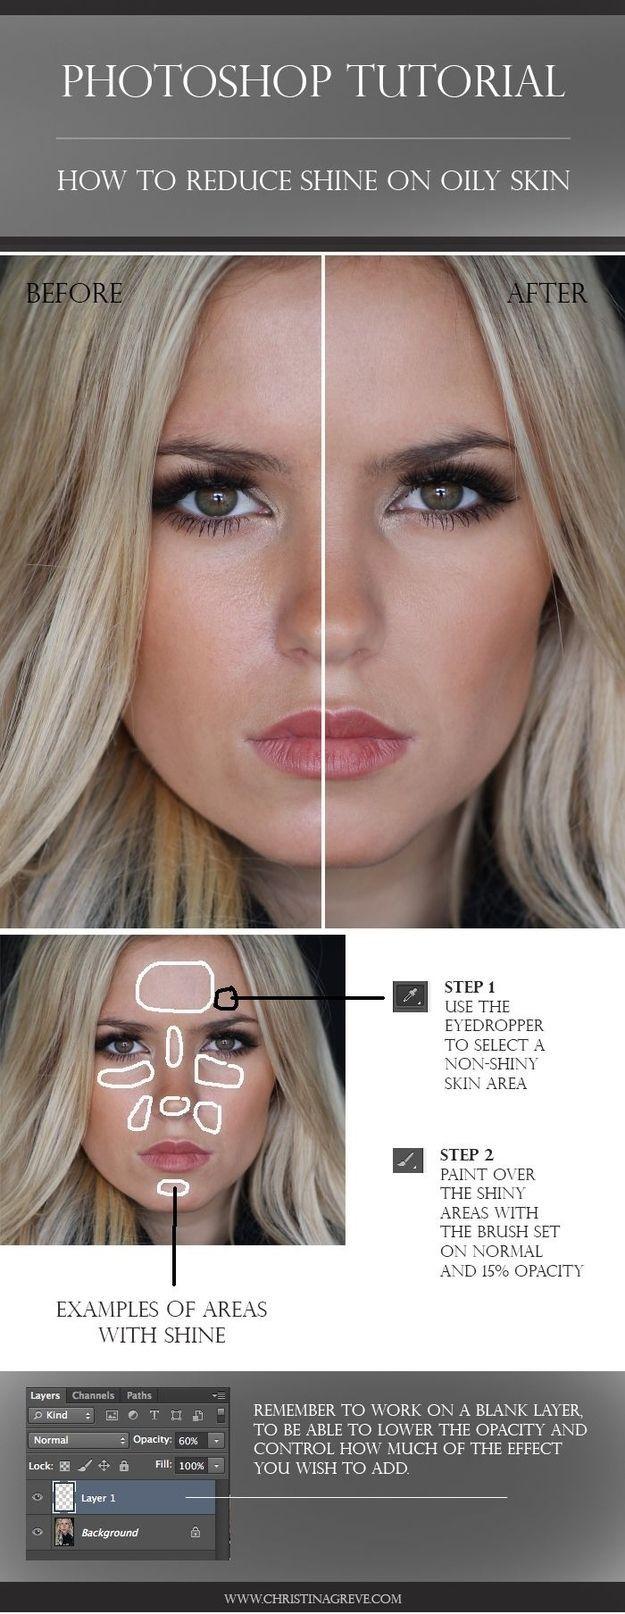 Mattify shiny skin. | 21 Incredibly Simple Photoshop Hacks Everyone Should Know